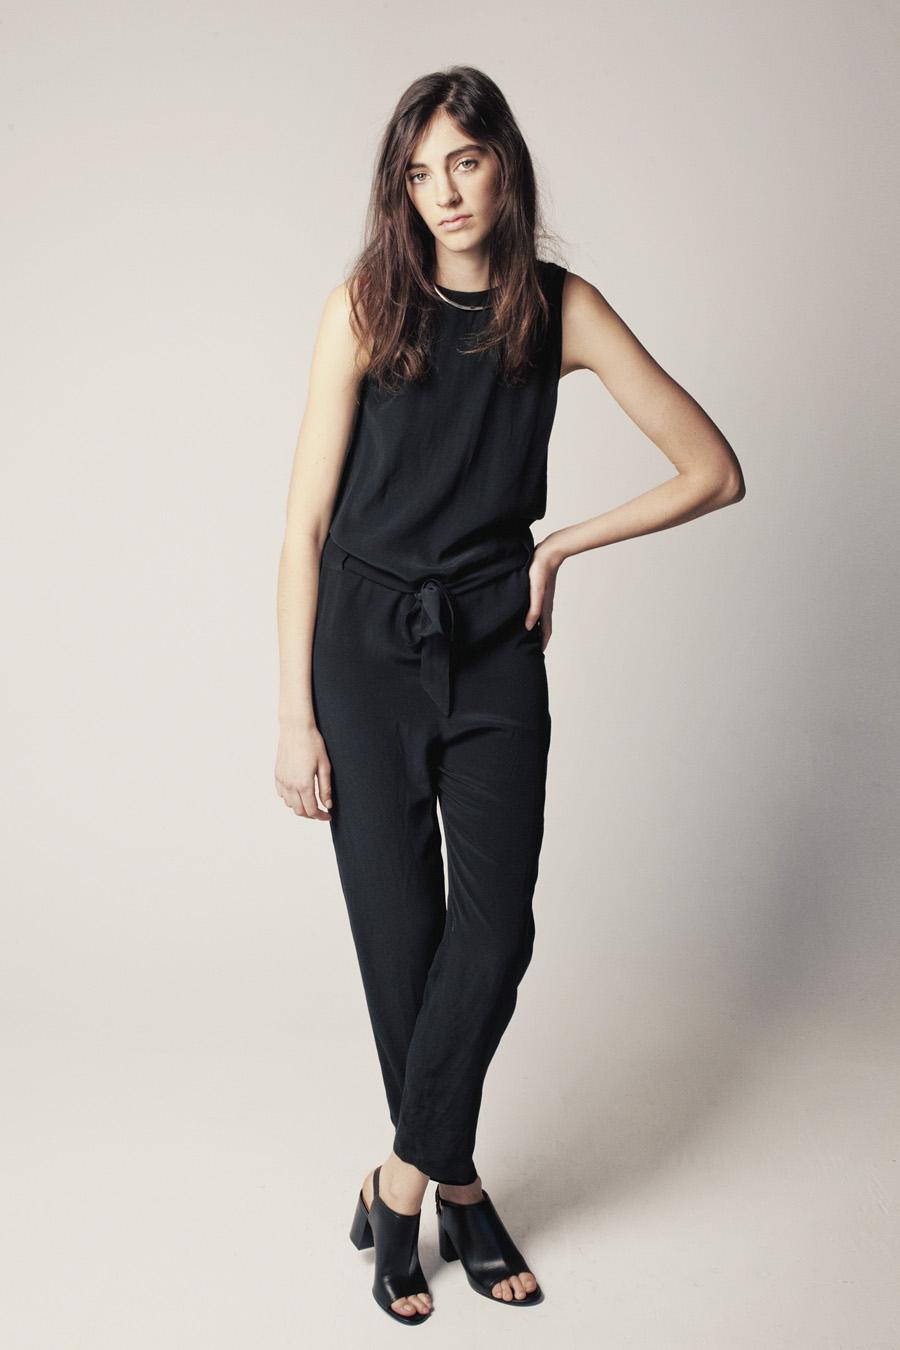 Babe-FW13-lookbook-LauraSelfridge-HayleyJumper-12.jpg